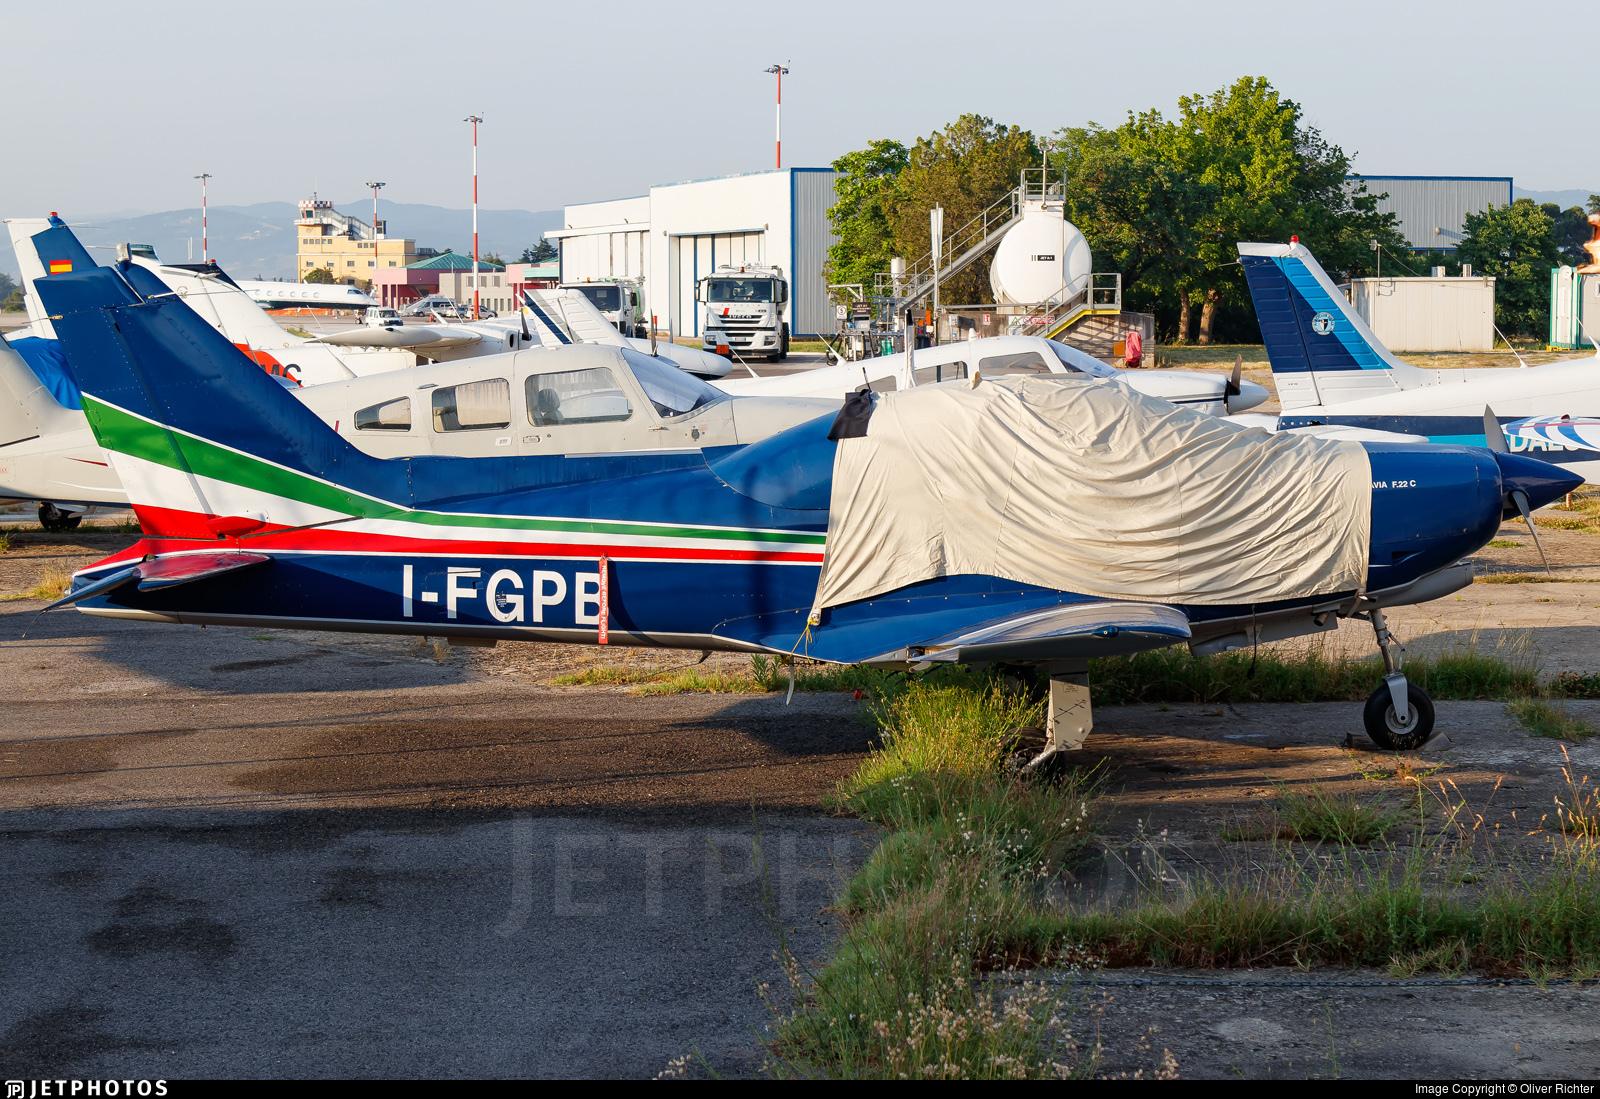 I-FGPB - General Avia F22C Pinguino - Private